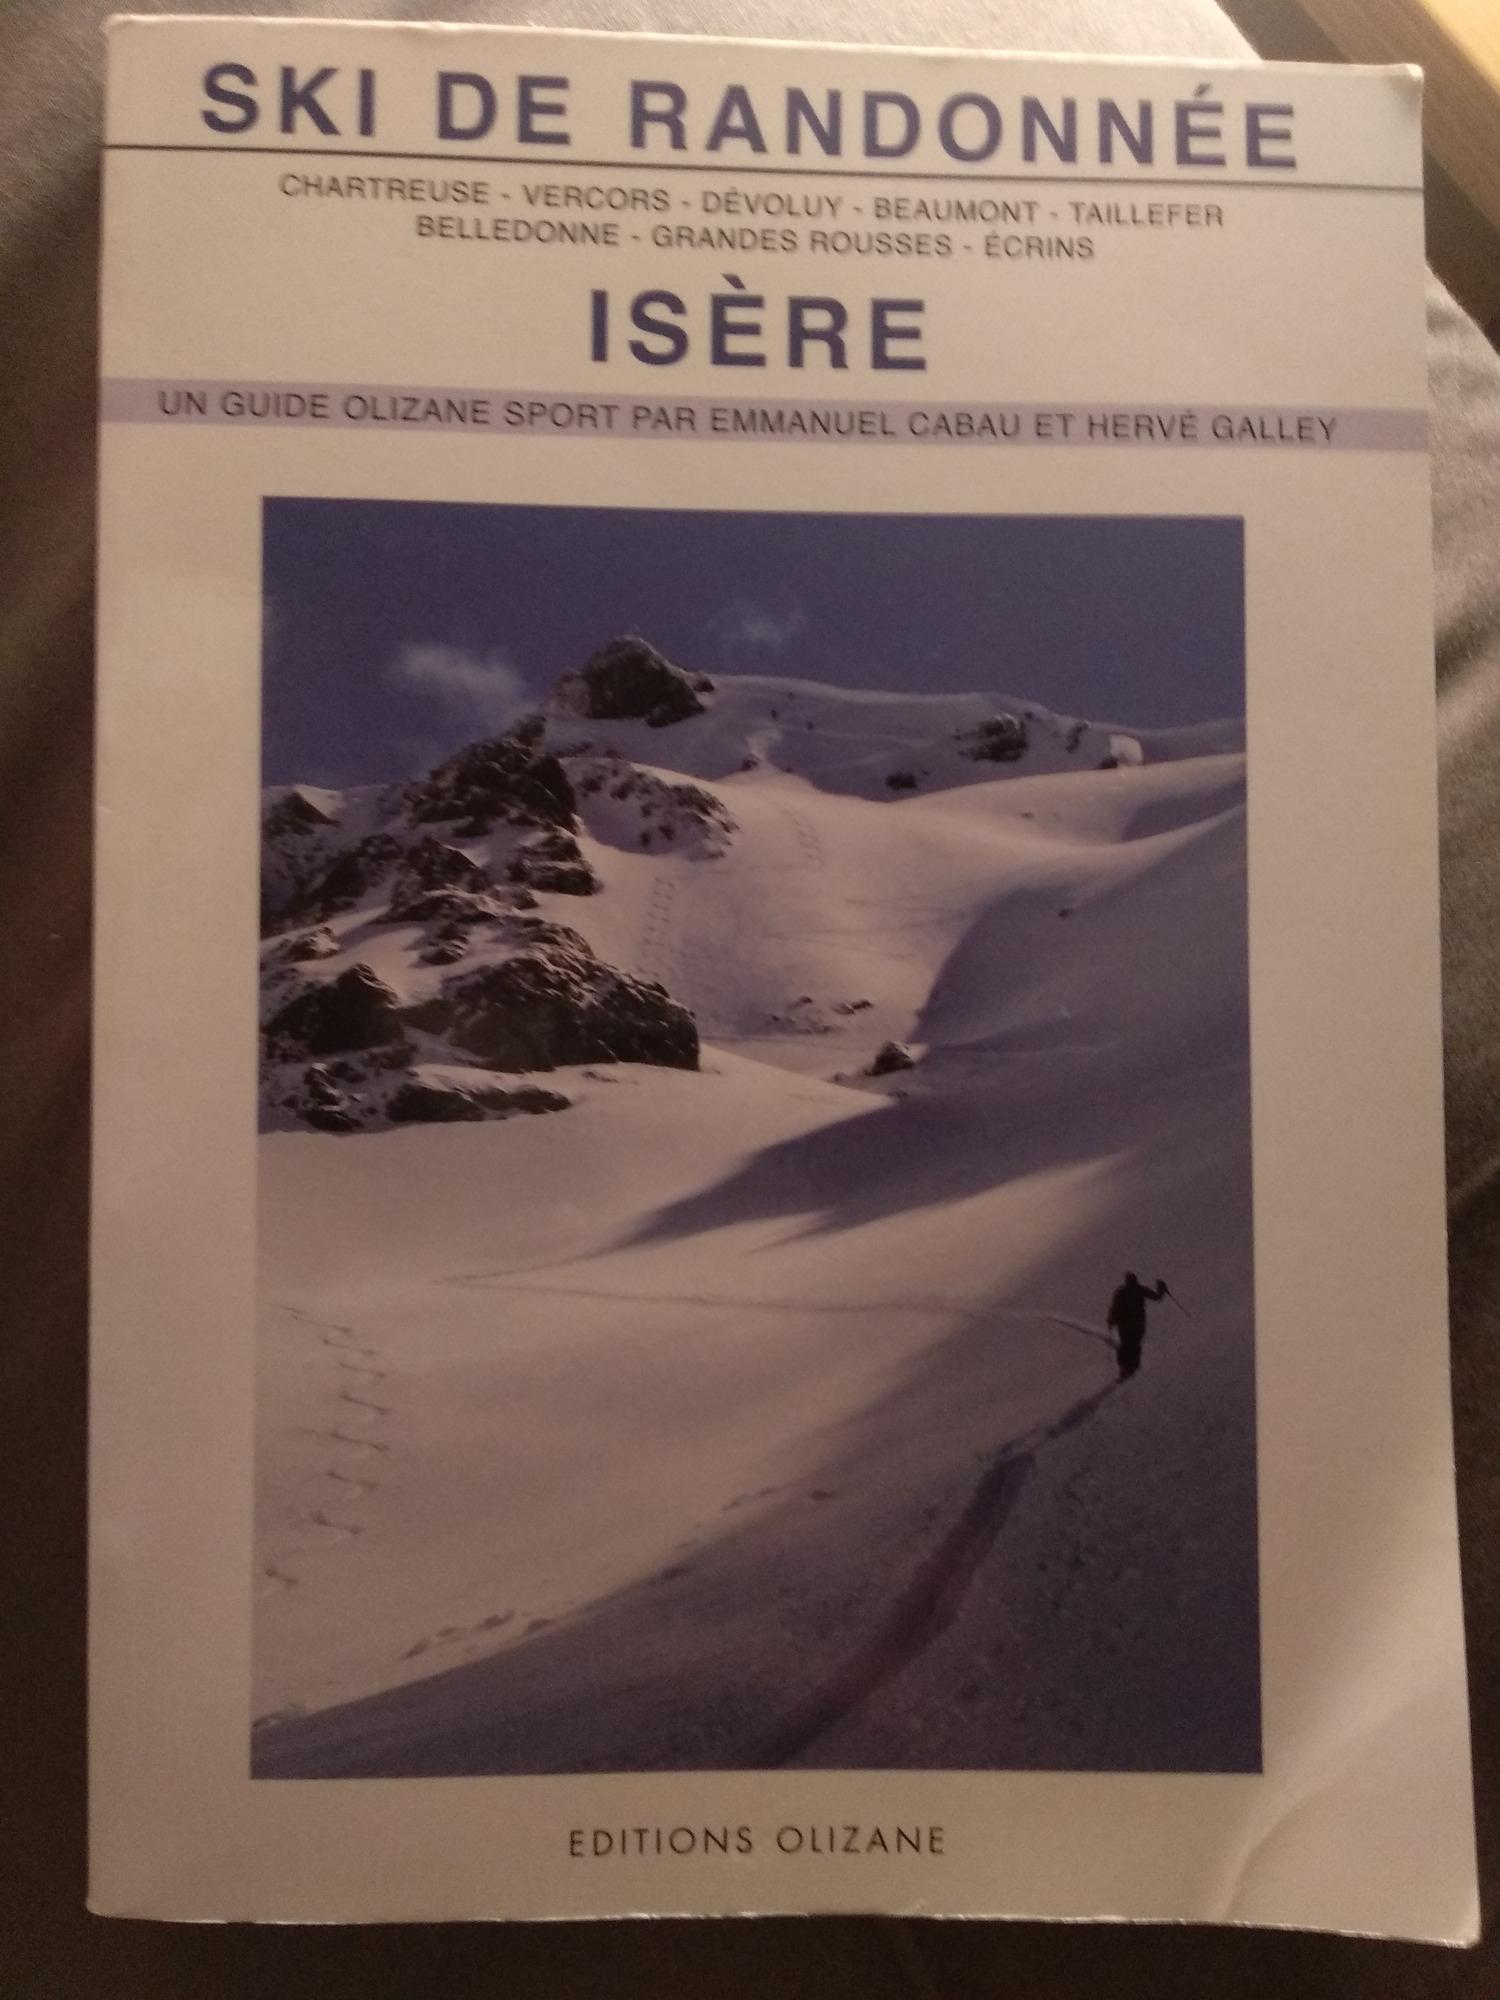 Editions Olizane Ski de randonnée - Isère